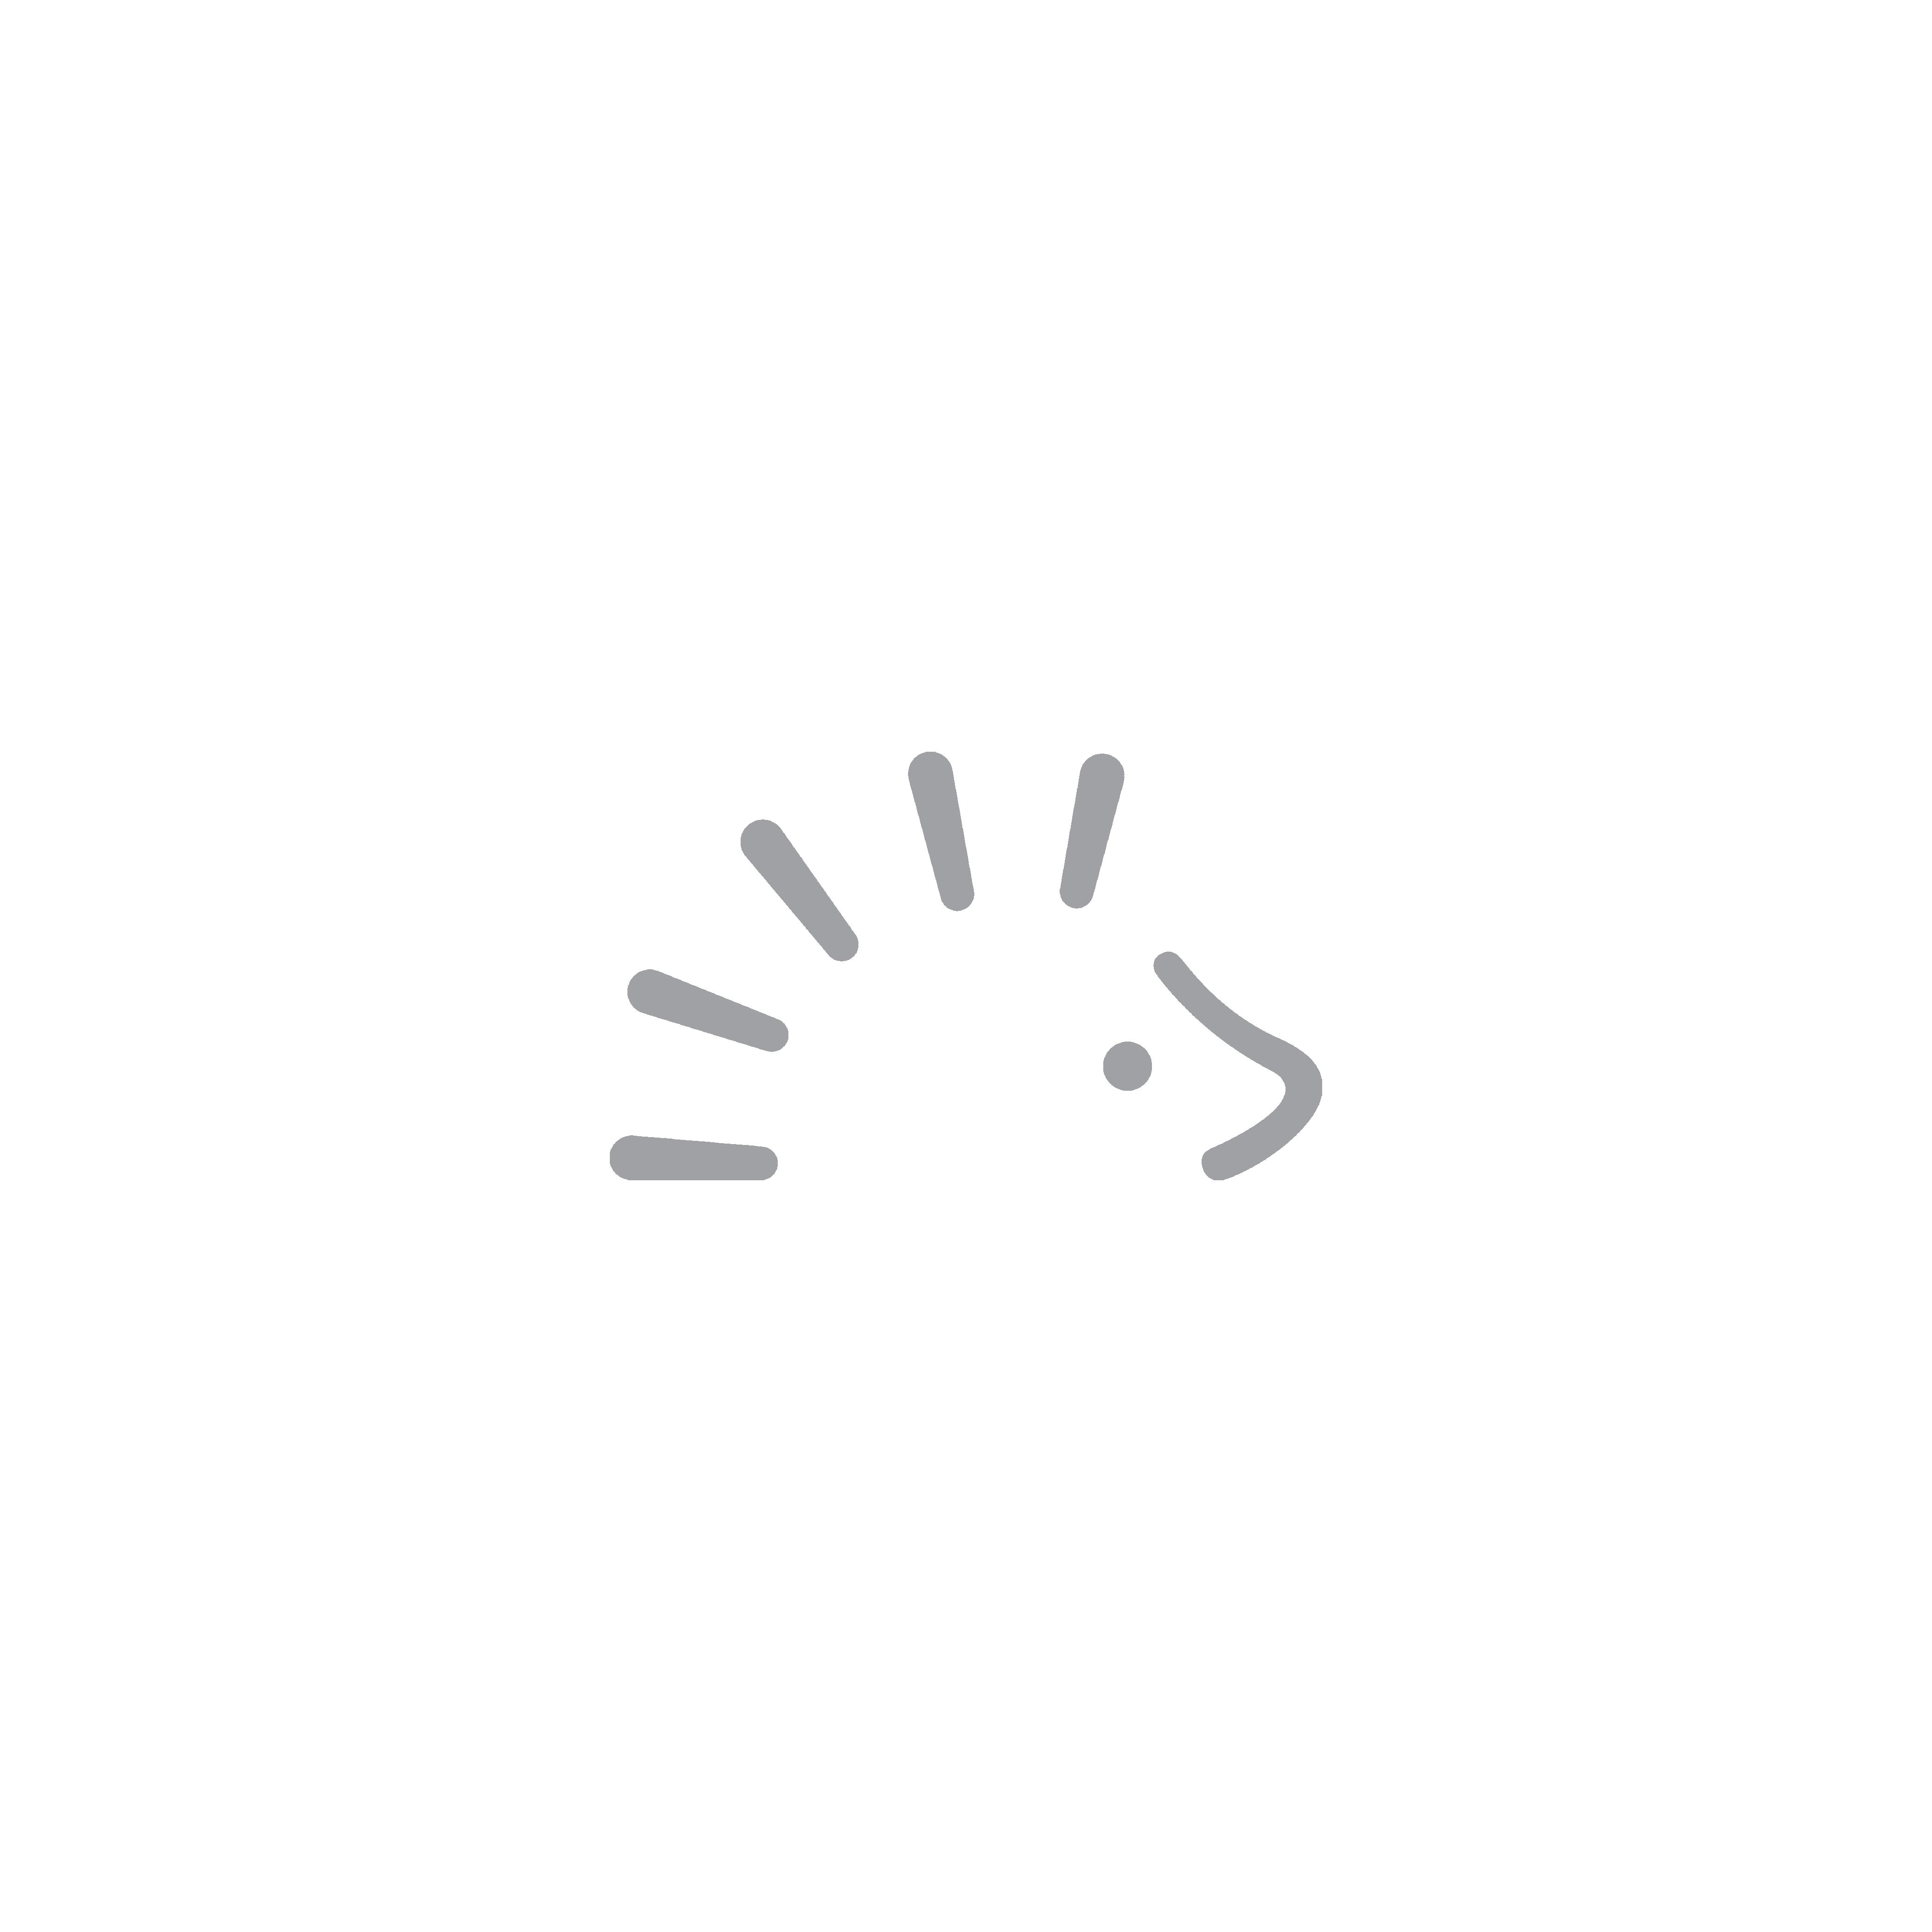 2x Saugeinlage Stay-Dry Interlock Soft/Stay-Dry